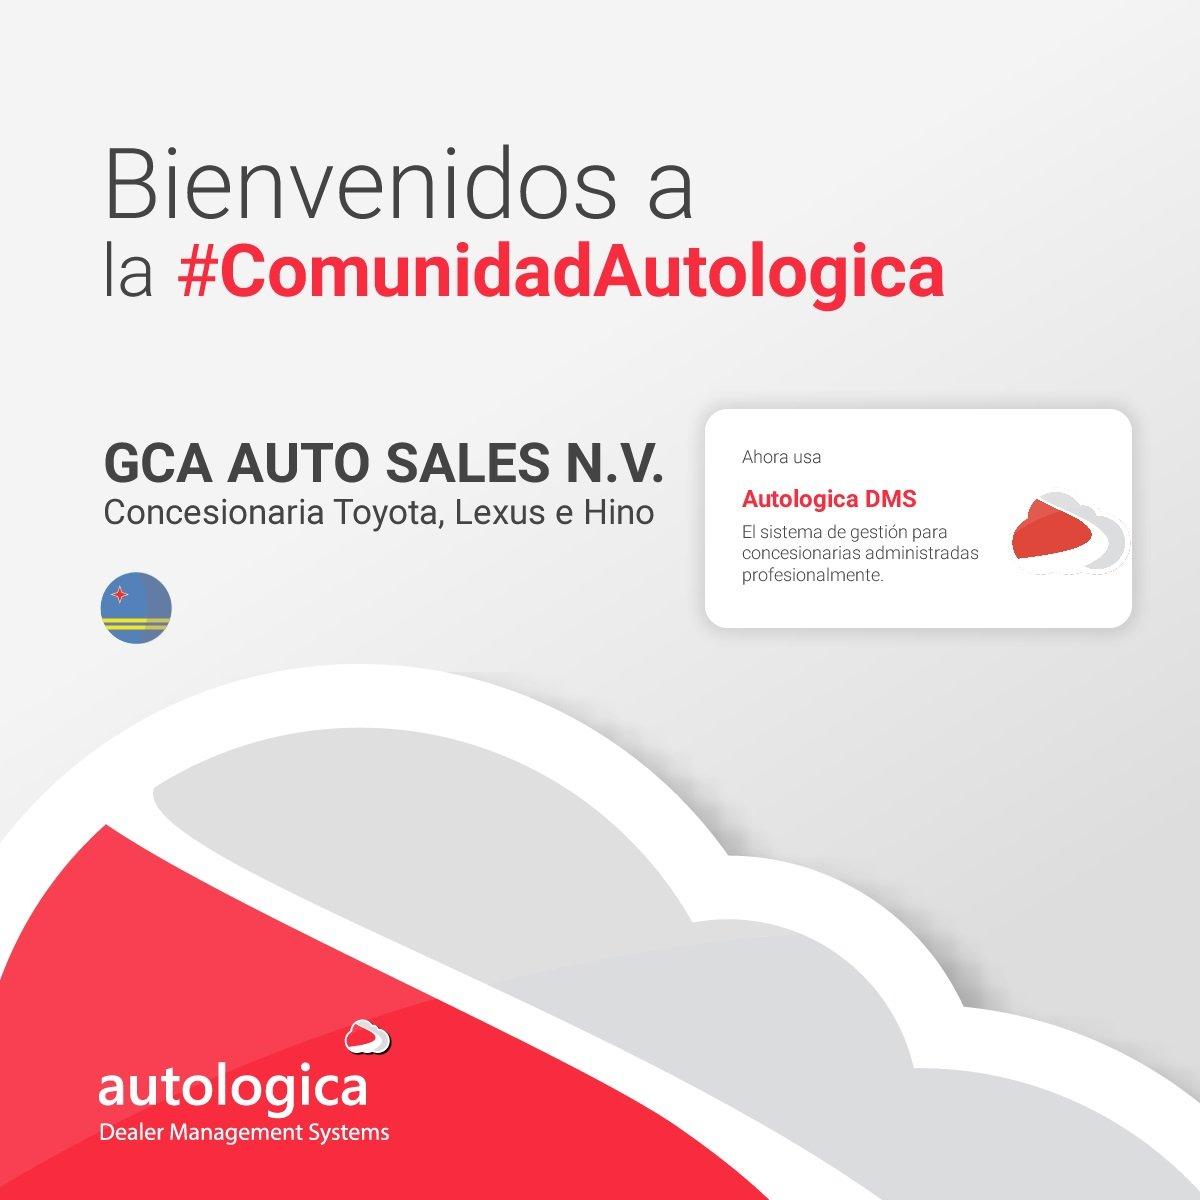 CGA AUTO (Aruba) - Autologica DMS